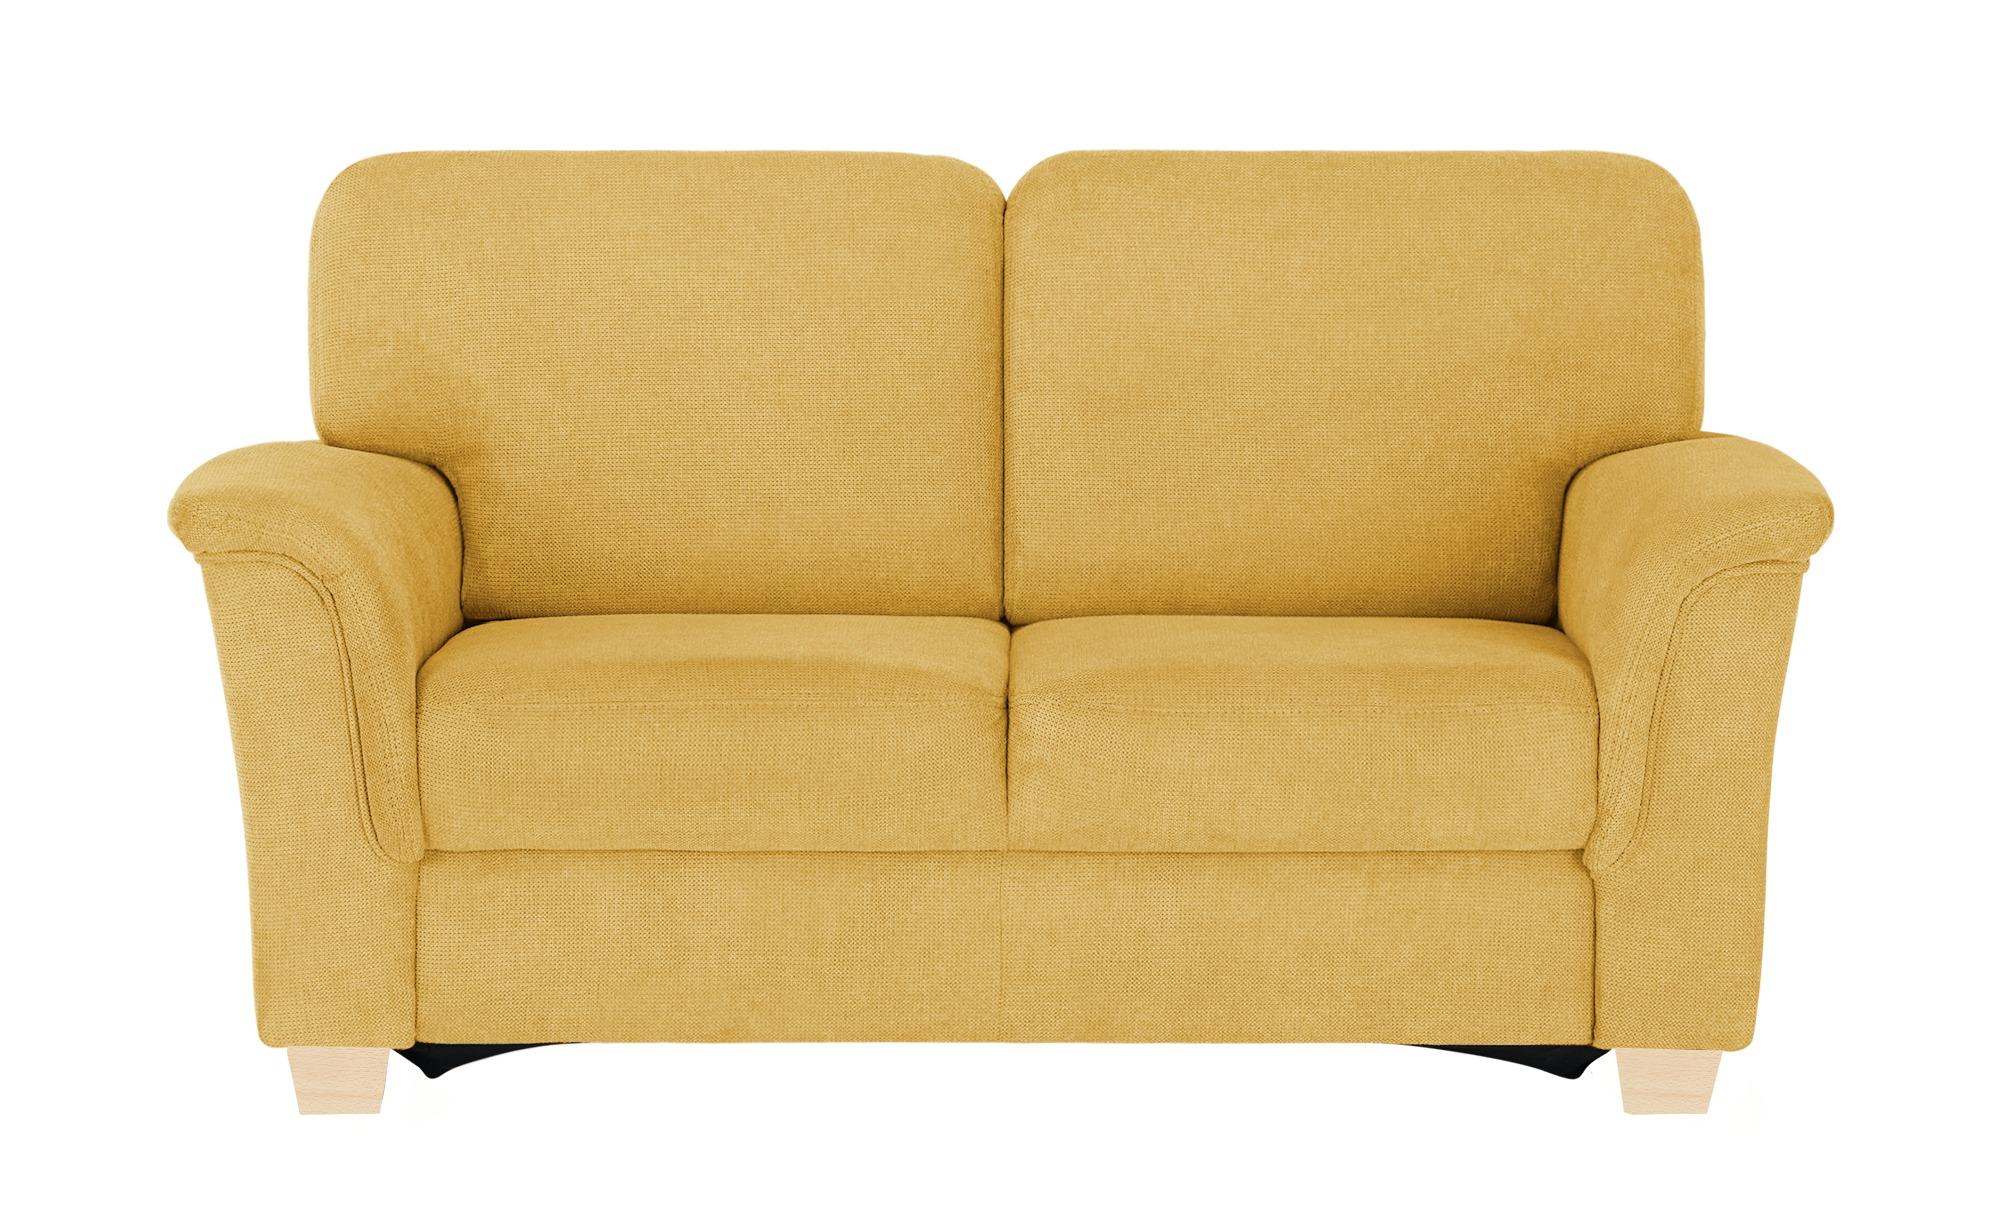 smart Sofa  Valencia ¦ gelb ¦ Maße (cm): B: 164 H: 90 T: 93 Polstermöbel > Sofas > 2-Sitzer - Höffner